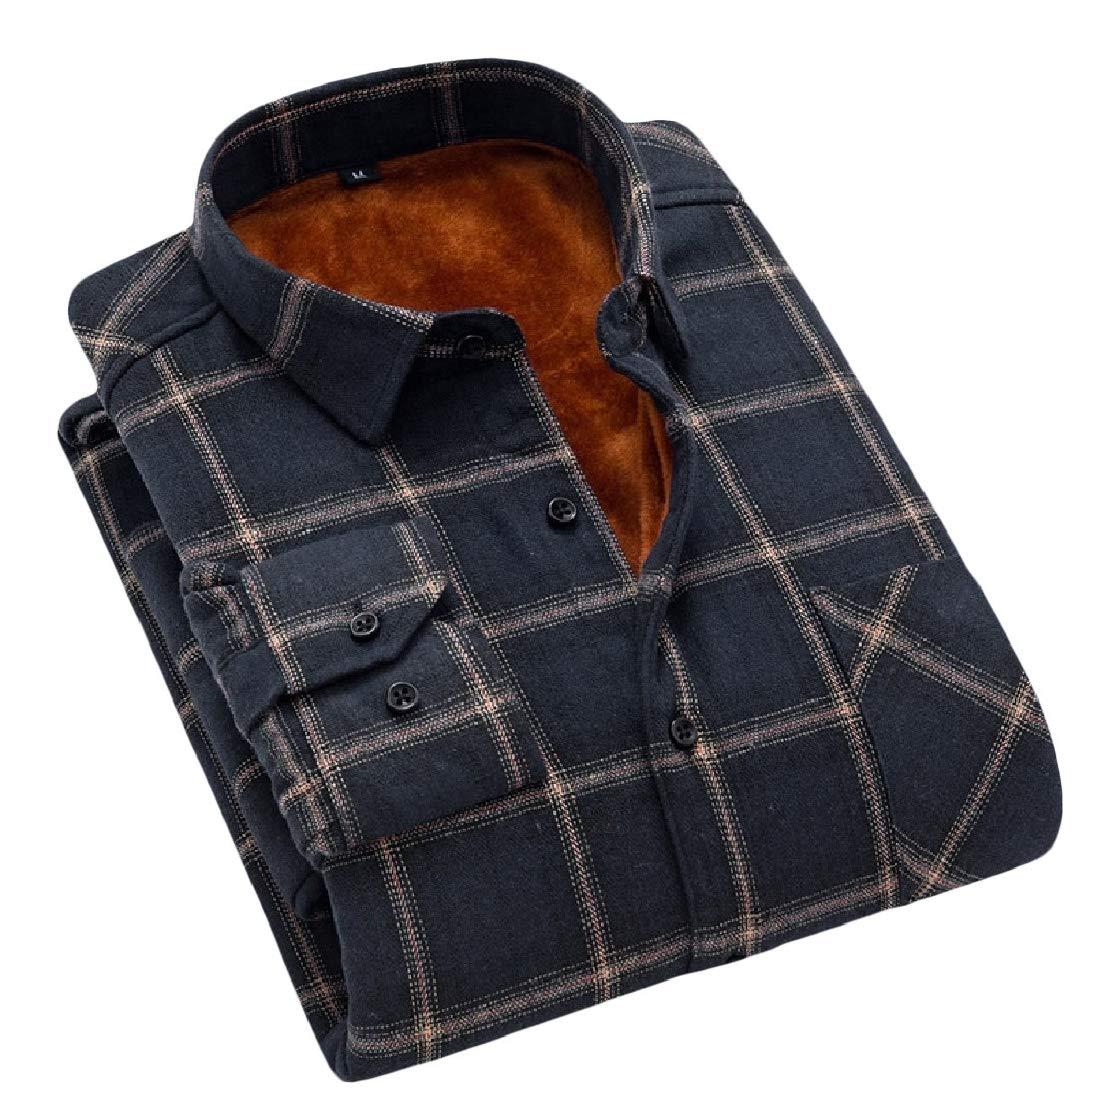 YUNY Mens Plaid Pattern Keep Warm Casual Thick Fall Winter Flannel Dress Shirts AS9 M